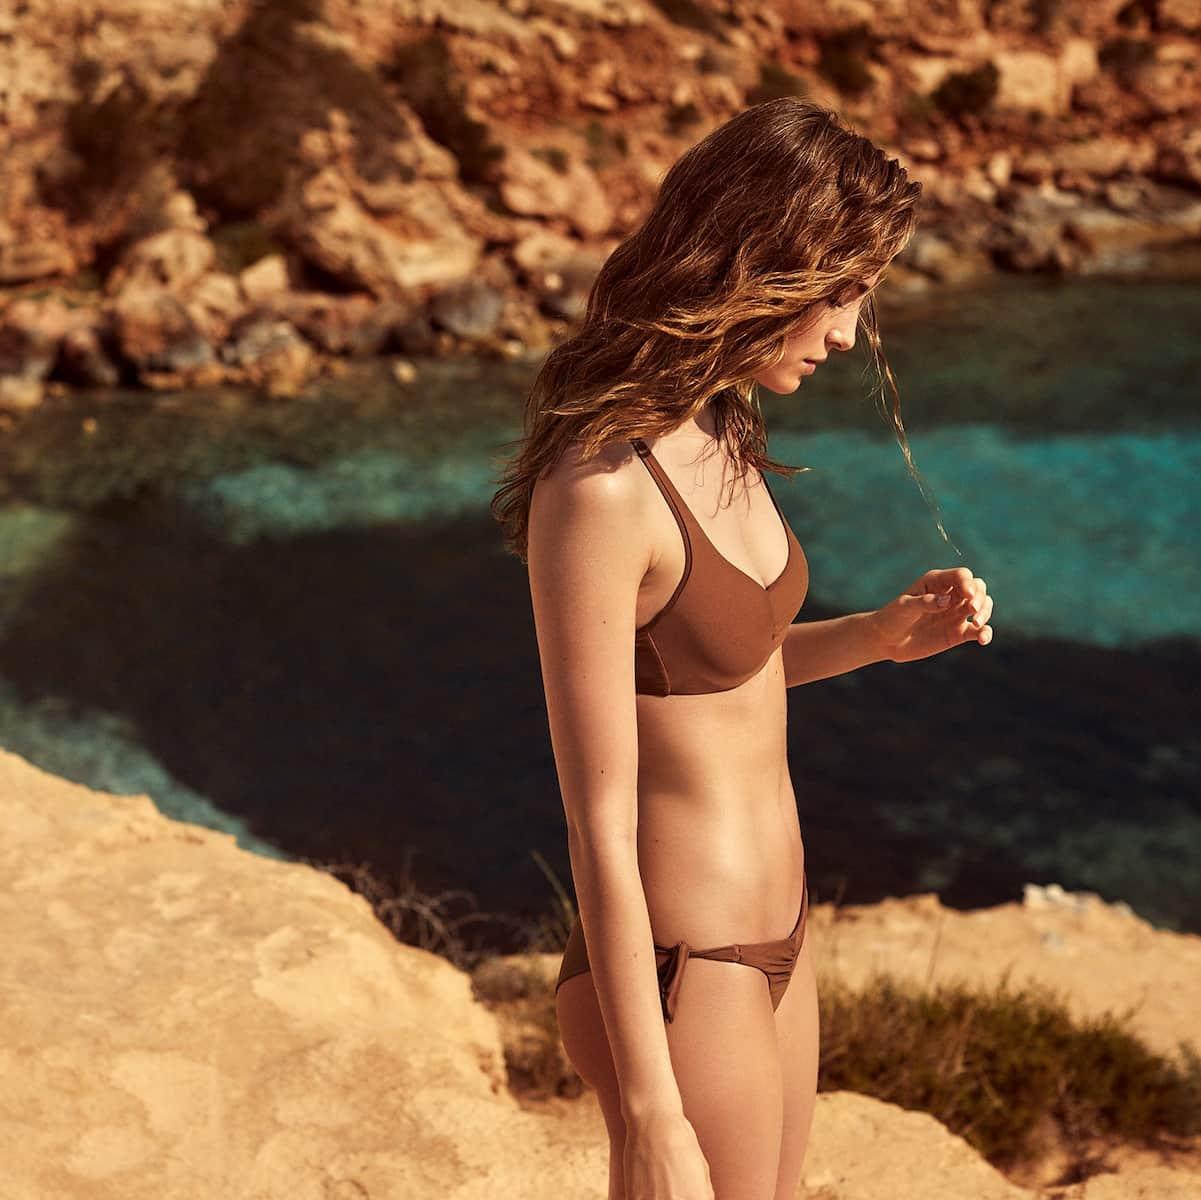 Bikini von Andres Sarda 2021, Modell Adichie